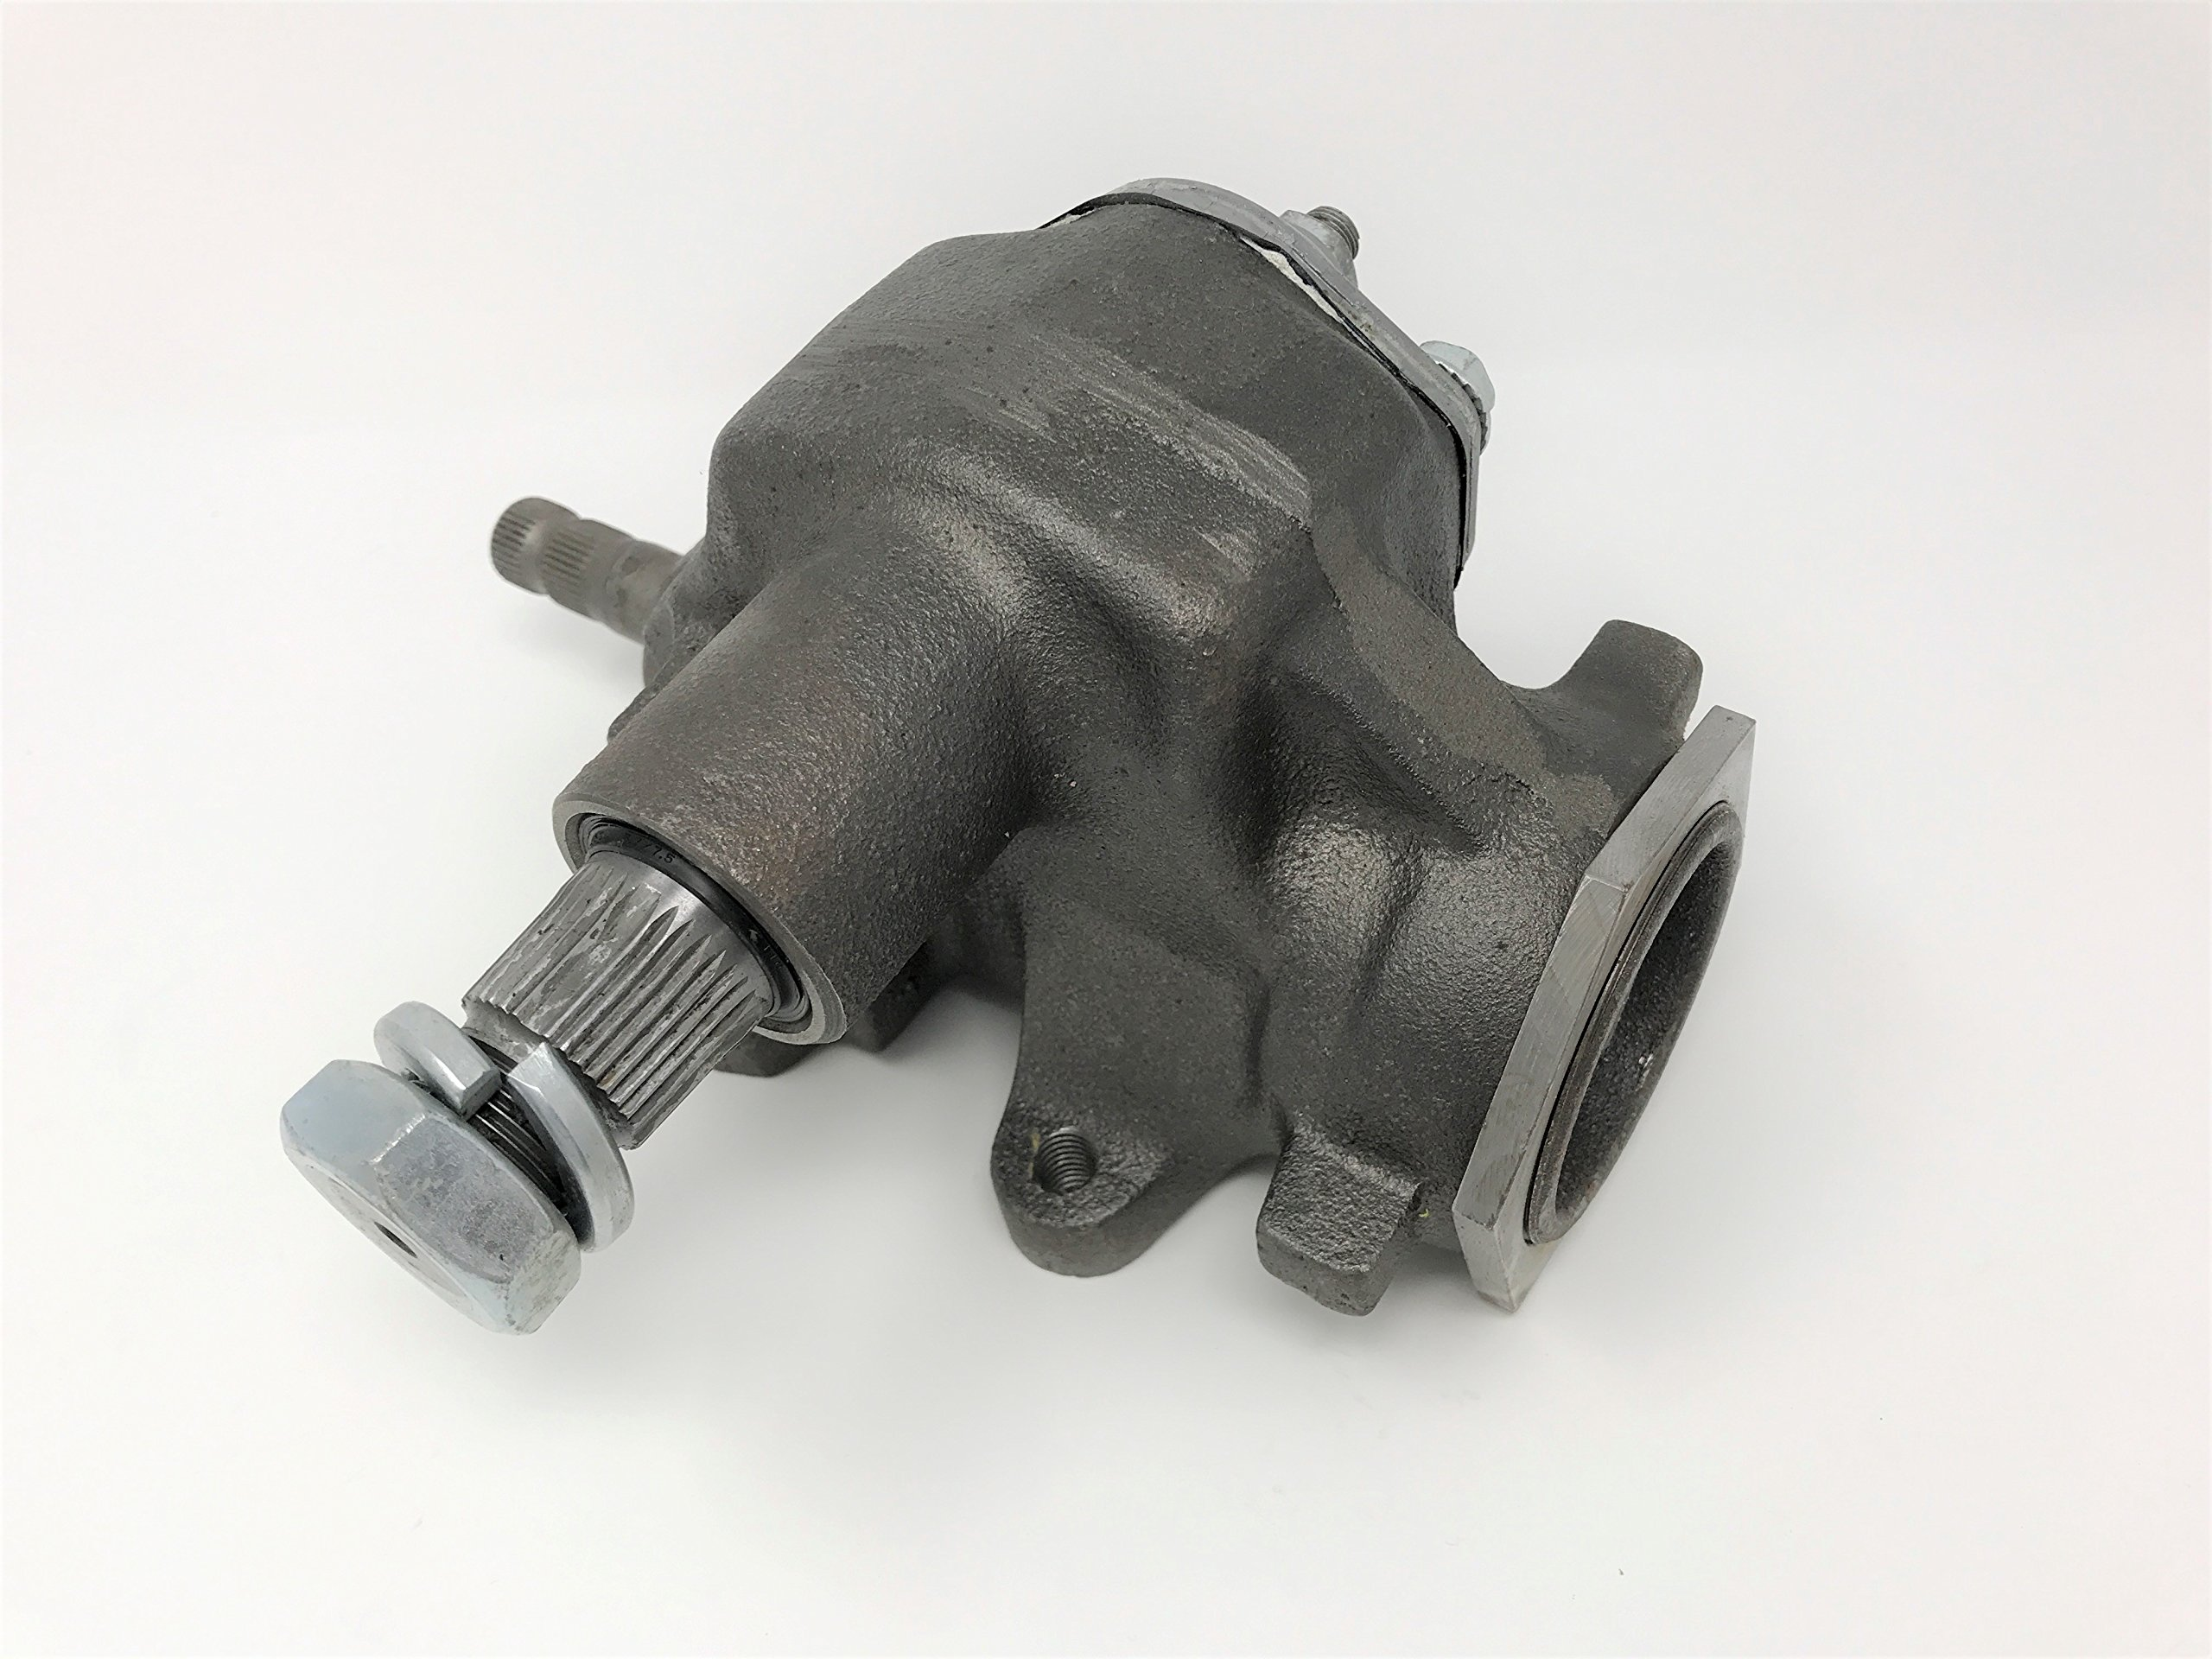 1103749C91 881548C93 881548C92 Steering Gear Assembly for Dresser, International Wheel Loaders